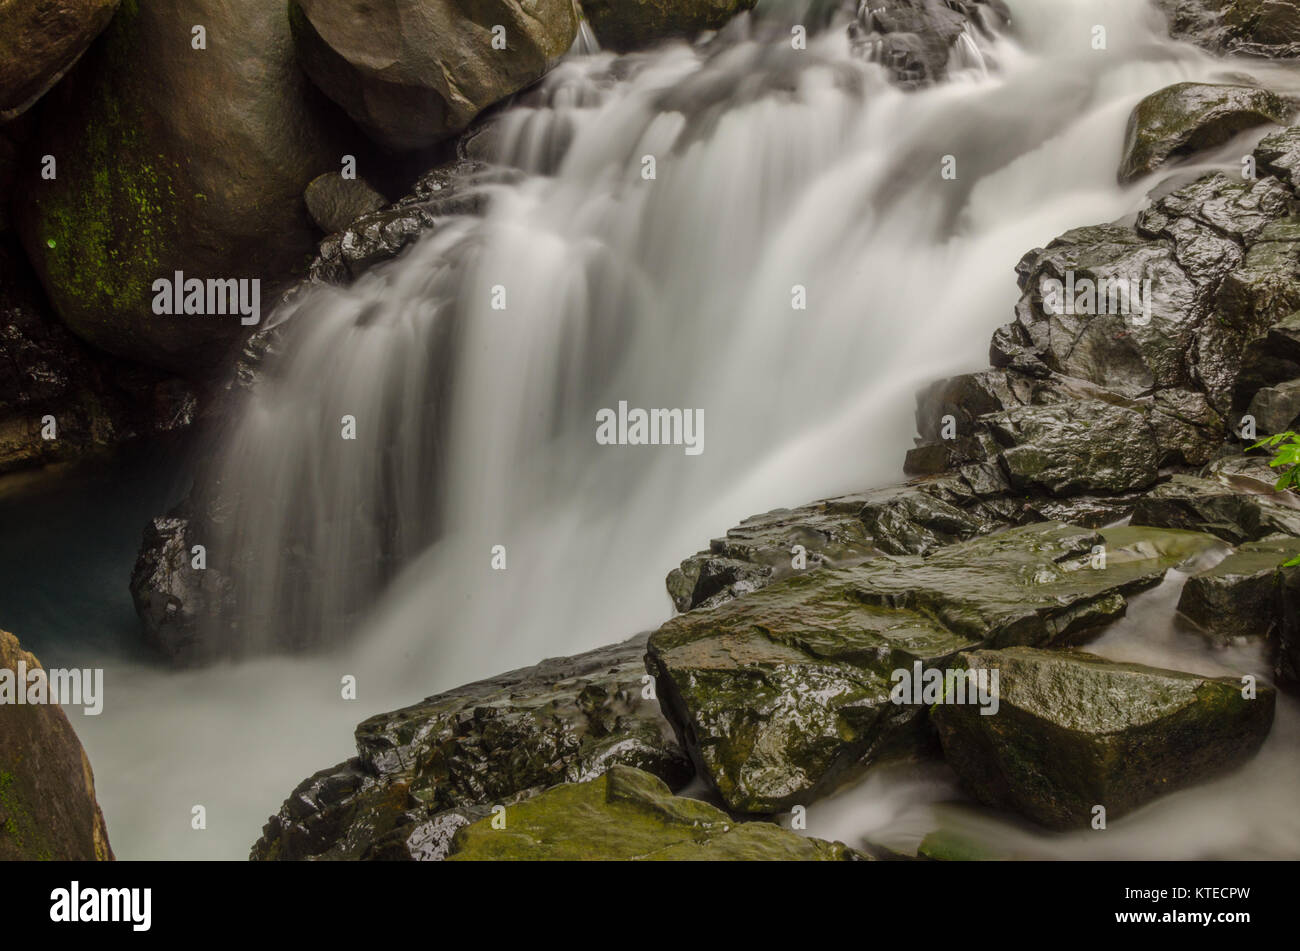 Nagarmadi Water Falls, Chendia, Karnataka, India - Stock Image